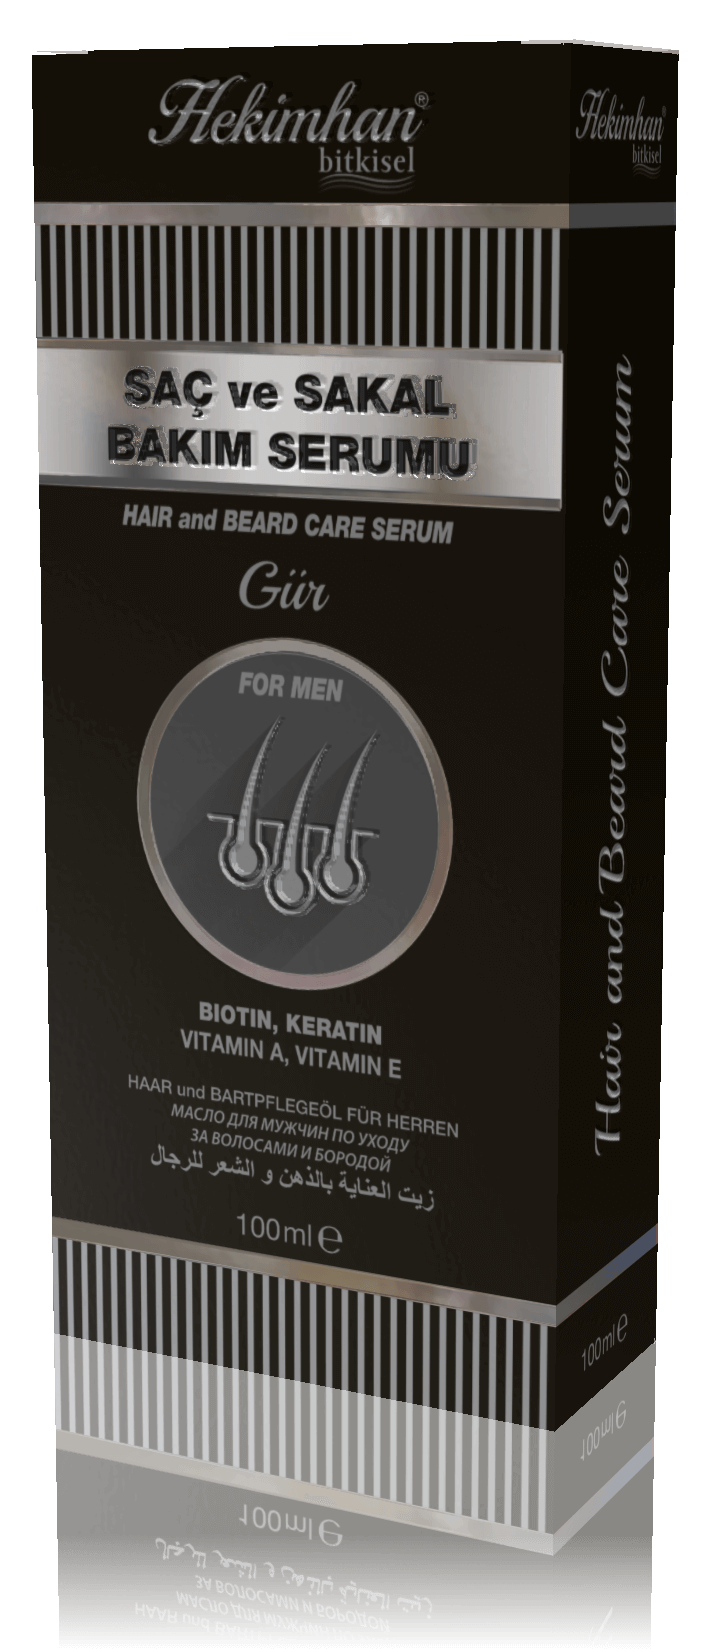 Hair and Beard Care Serum